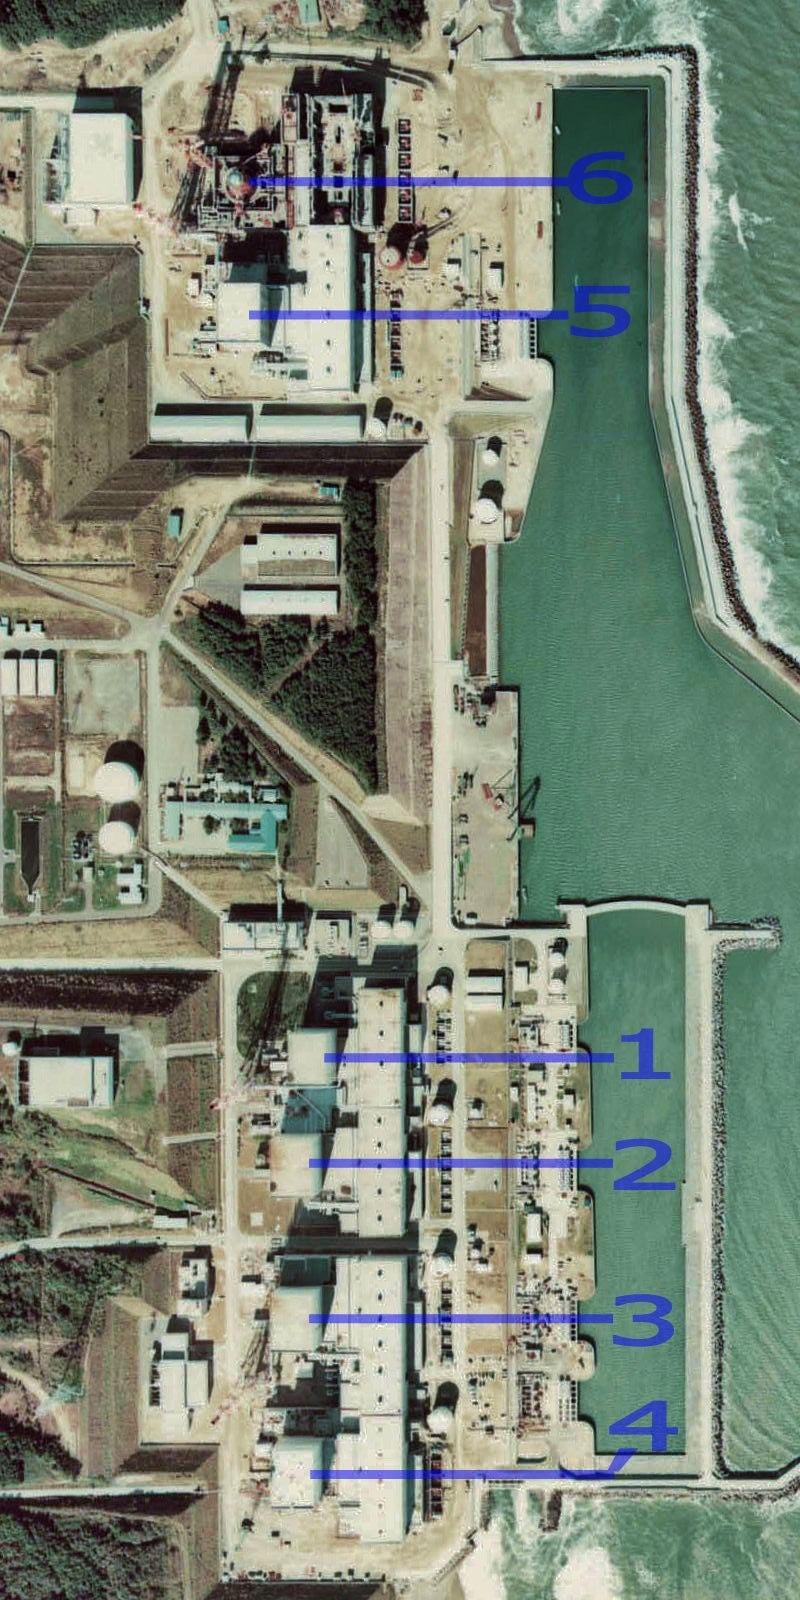 Fukushima I NPP 1975 medium crop rotated labeled